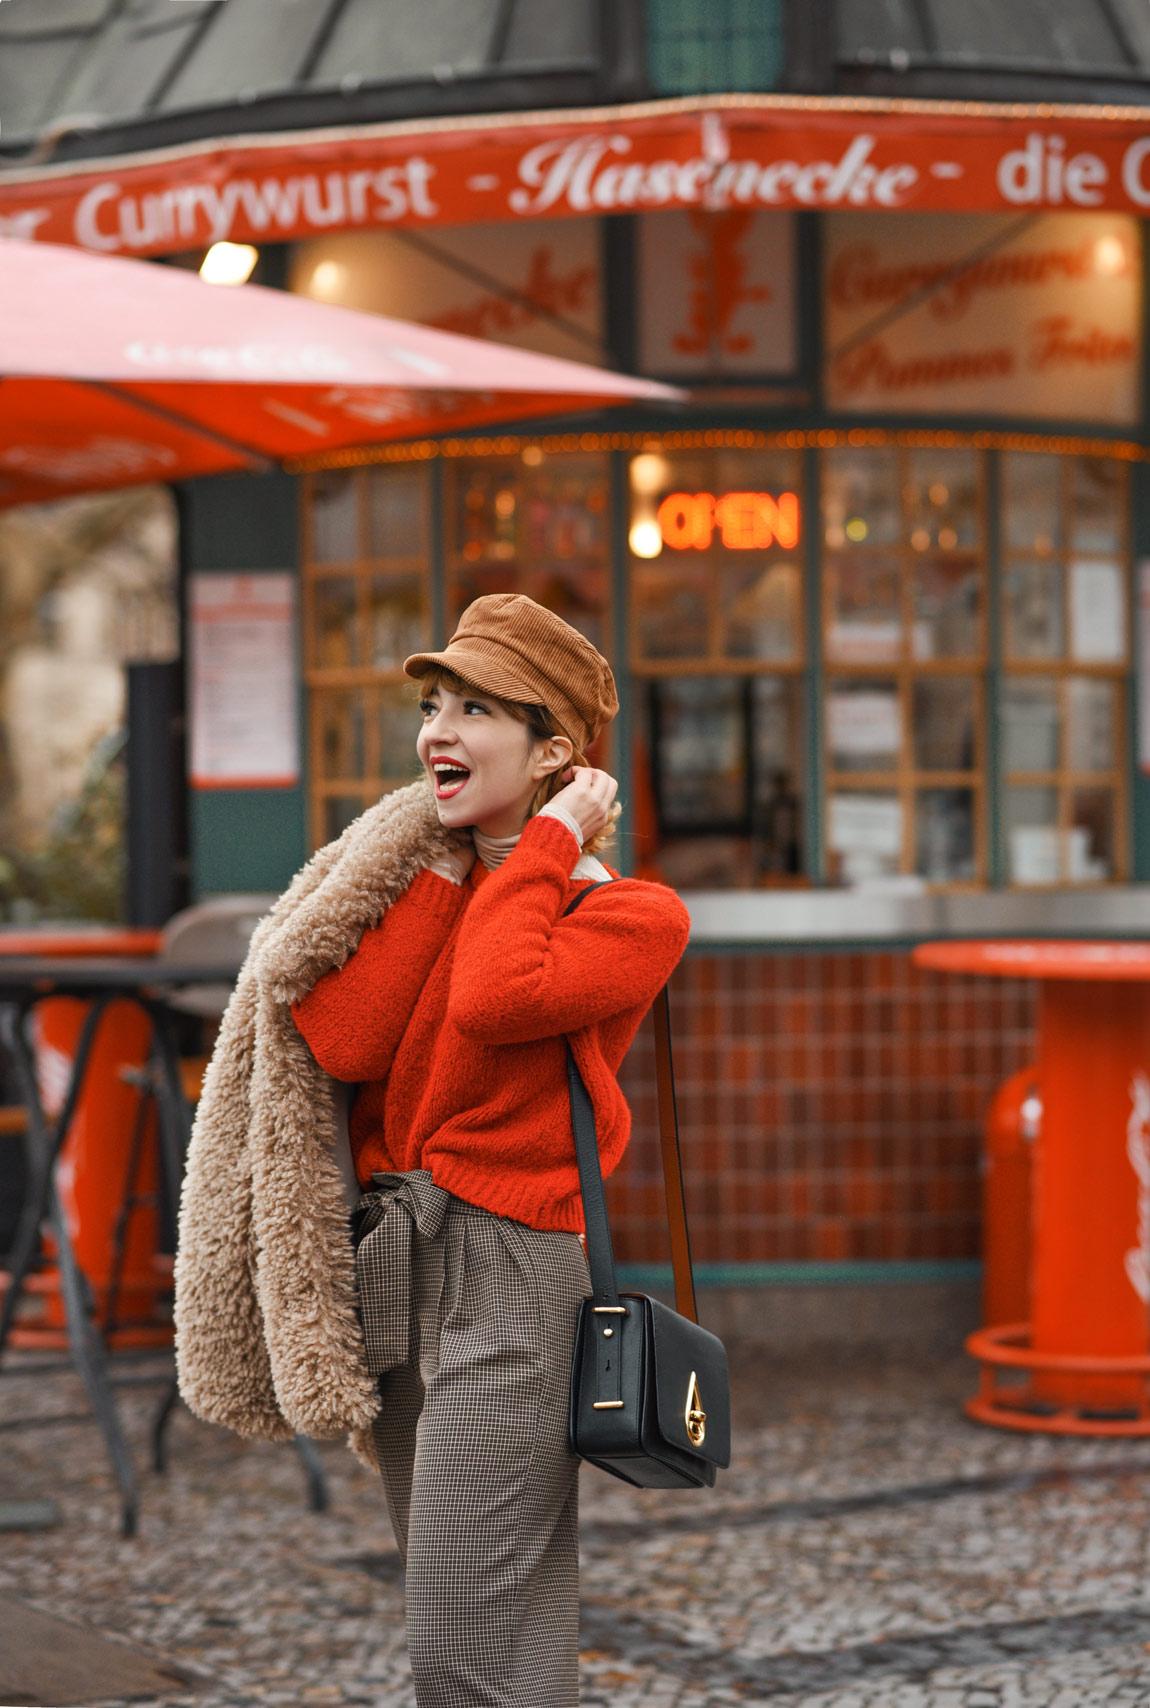 laestern, gesellschaft, outfit, berlin, fashionblog, lifestyleblogger, modeblog, outfit, winter, zara, kunstfell, jacke, teddy, braun, currywurst